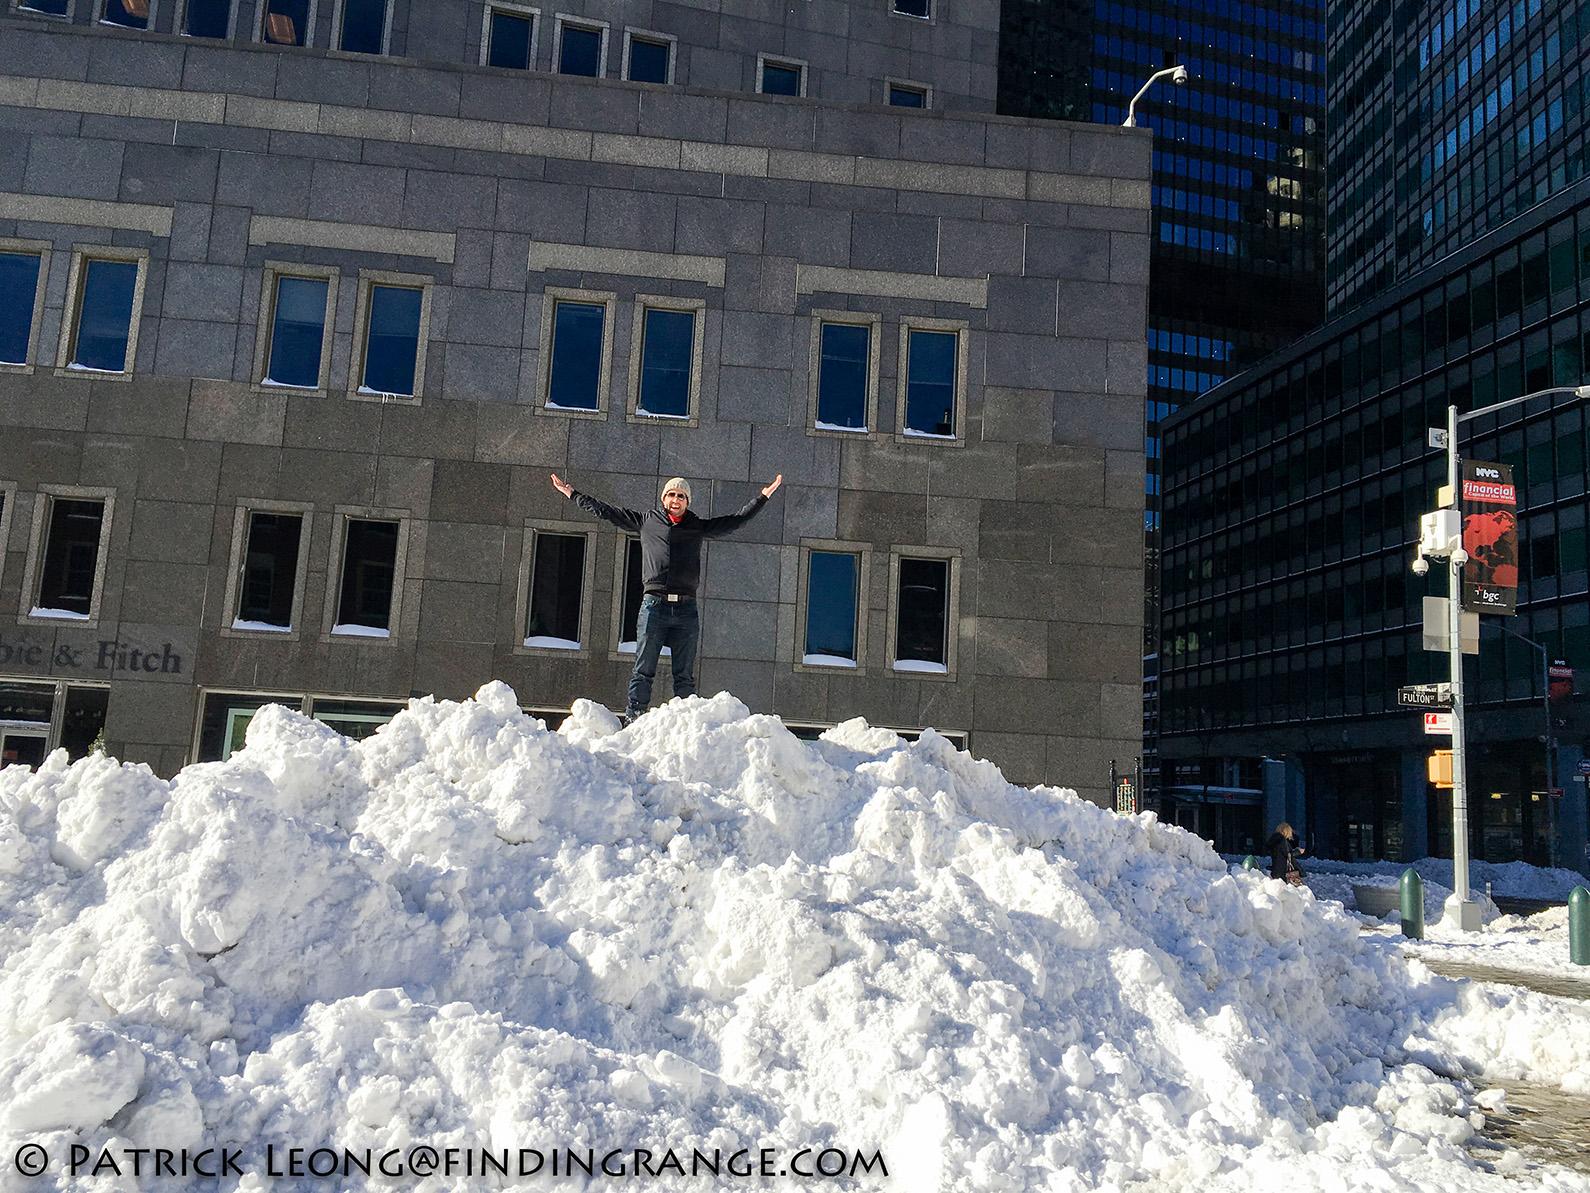 Winter-Storm-Jonas-New-York-City-5